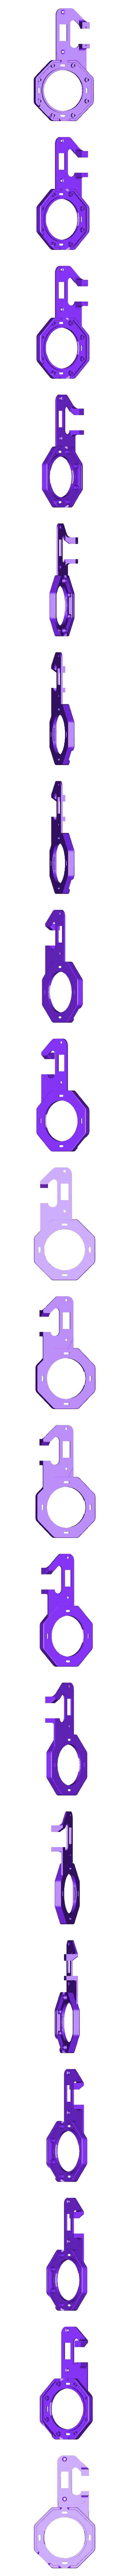 ble_switch_mount.stl Download free STL file Crickit Light Switch Servo Mount • Design to 3D print, Adafruit